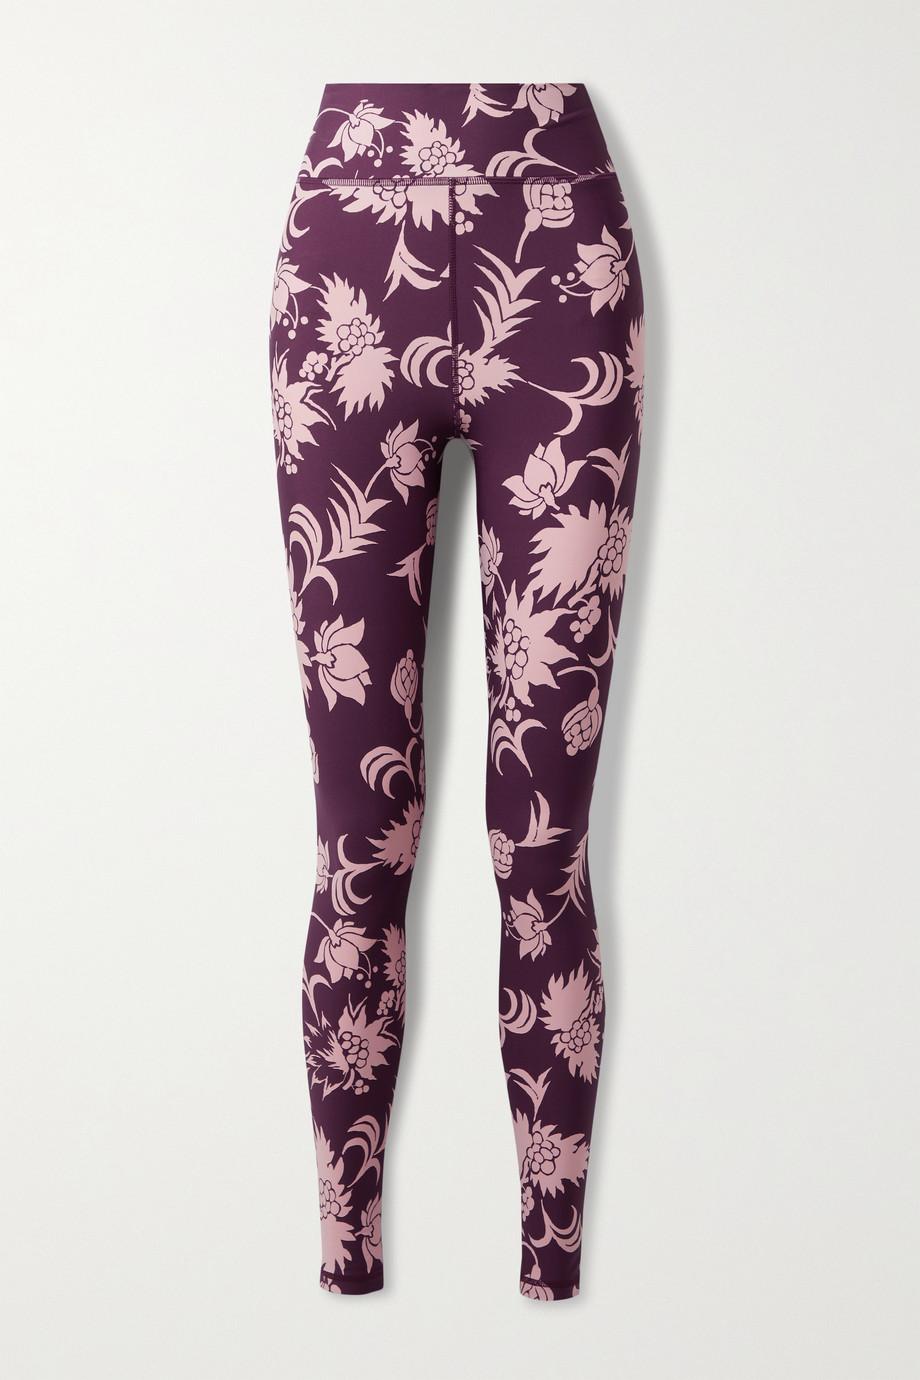 The Upside Kabuki Dance floral-print stretch leggings